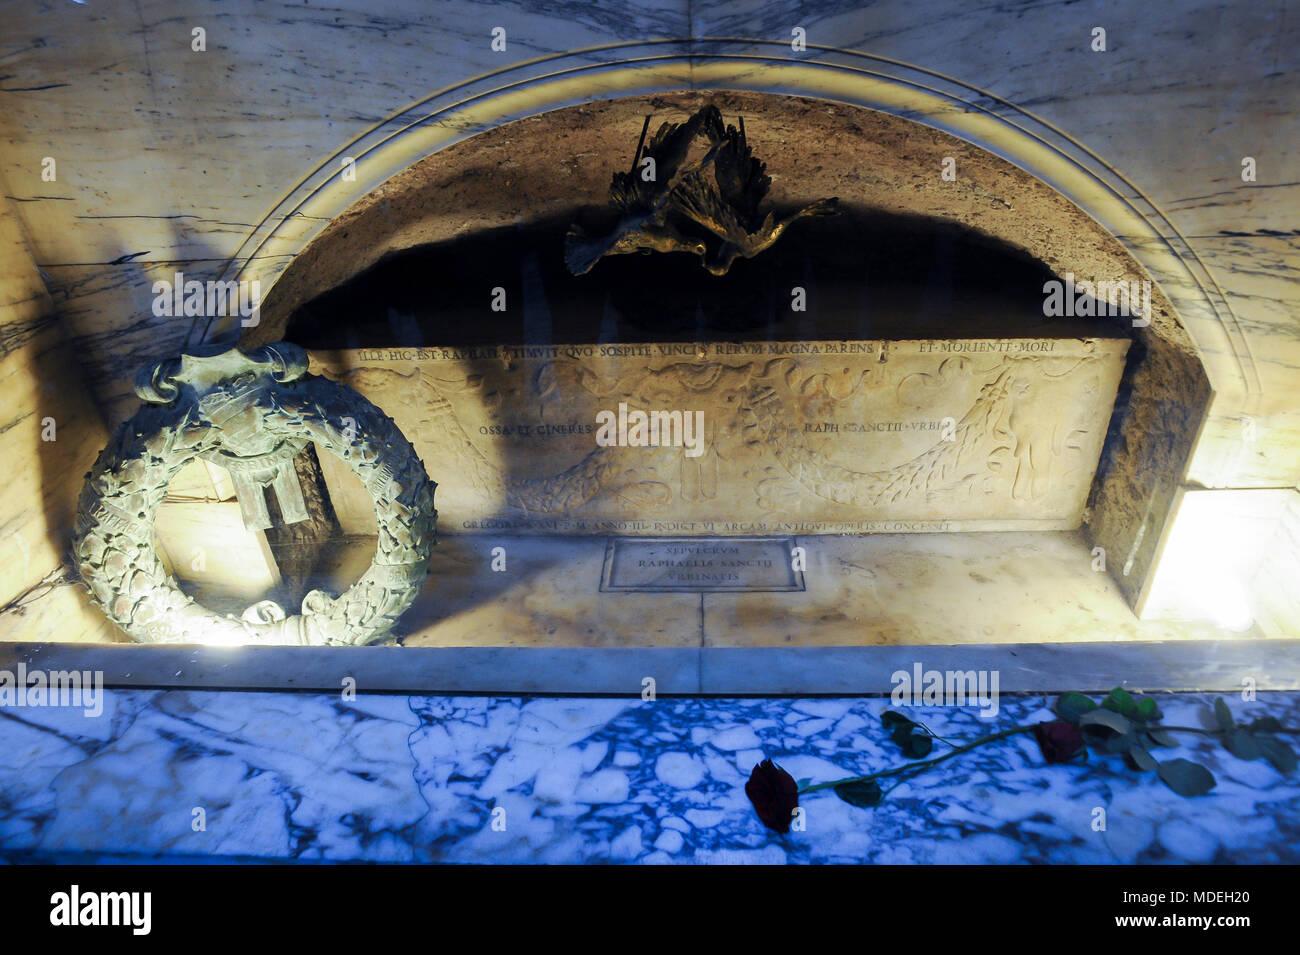 The tomb of Raphael in Pantheon or Basilica collegiata di Santa Maria ad Martyres (Basilica of St. Mary and the Martyrs) on Piazza della Rotonda in Hi Stock Photo